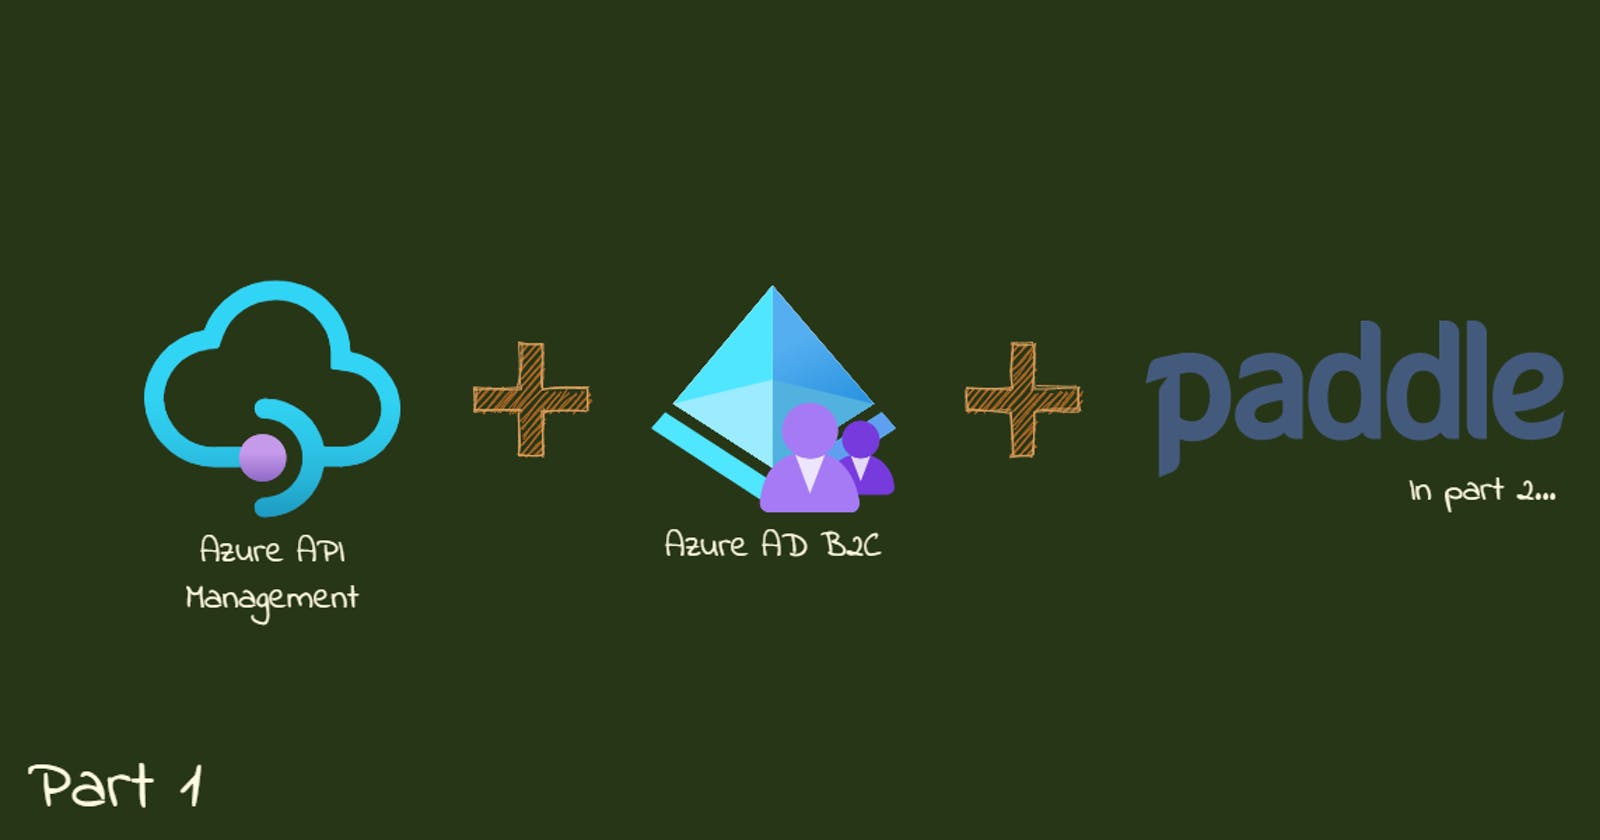 Connecting Azure API Management, Azure AD B2C, and Paddle with .net 5 Razor App, Part 1